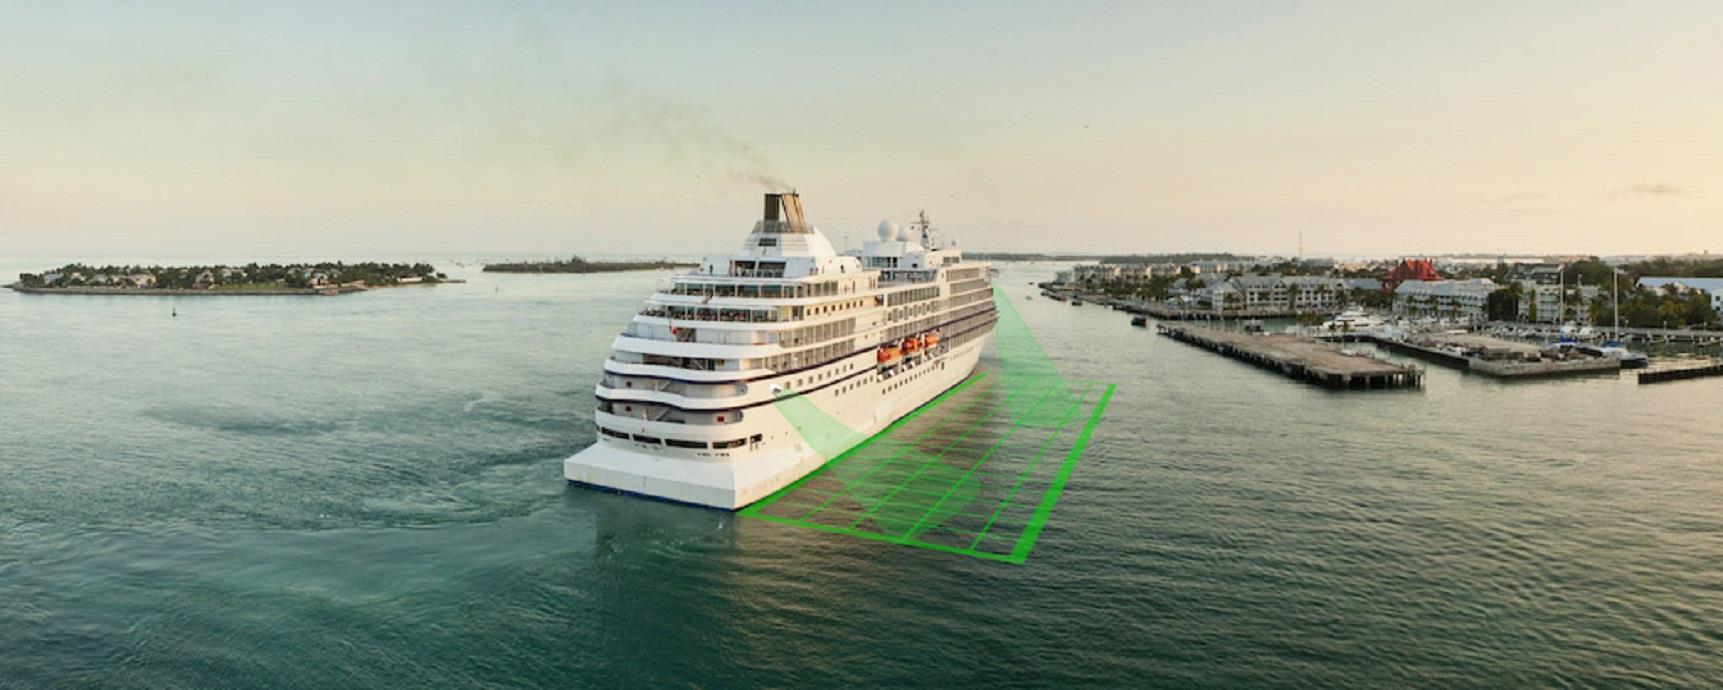 smartquay-solution-faster-safer-docking_resized